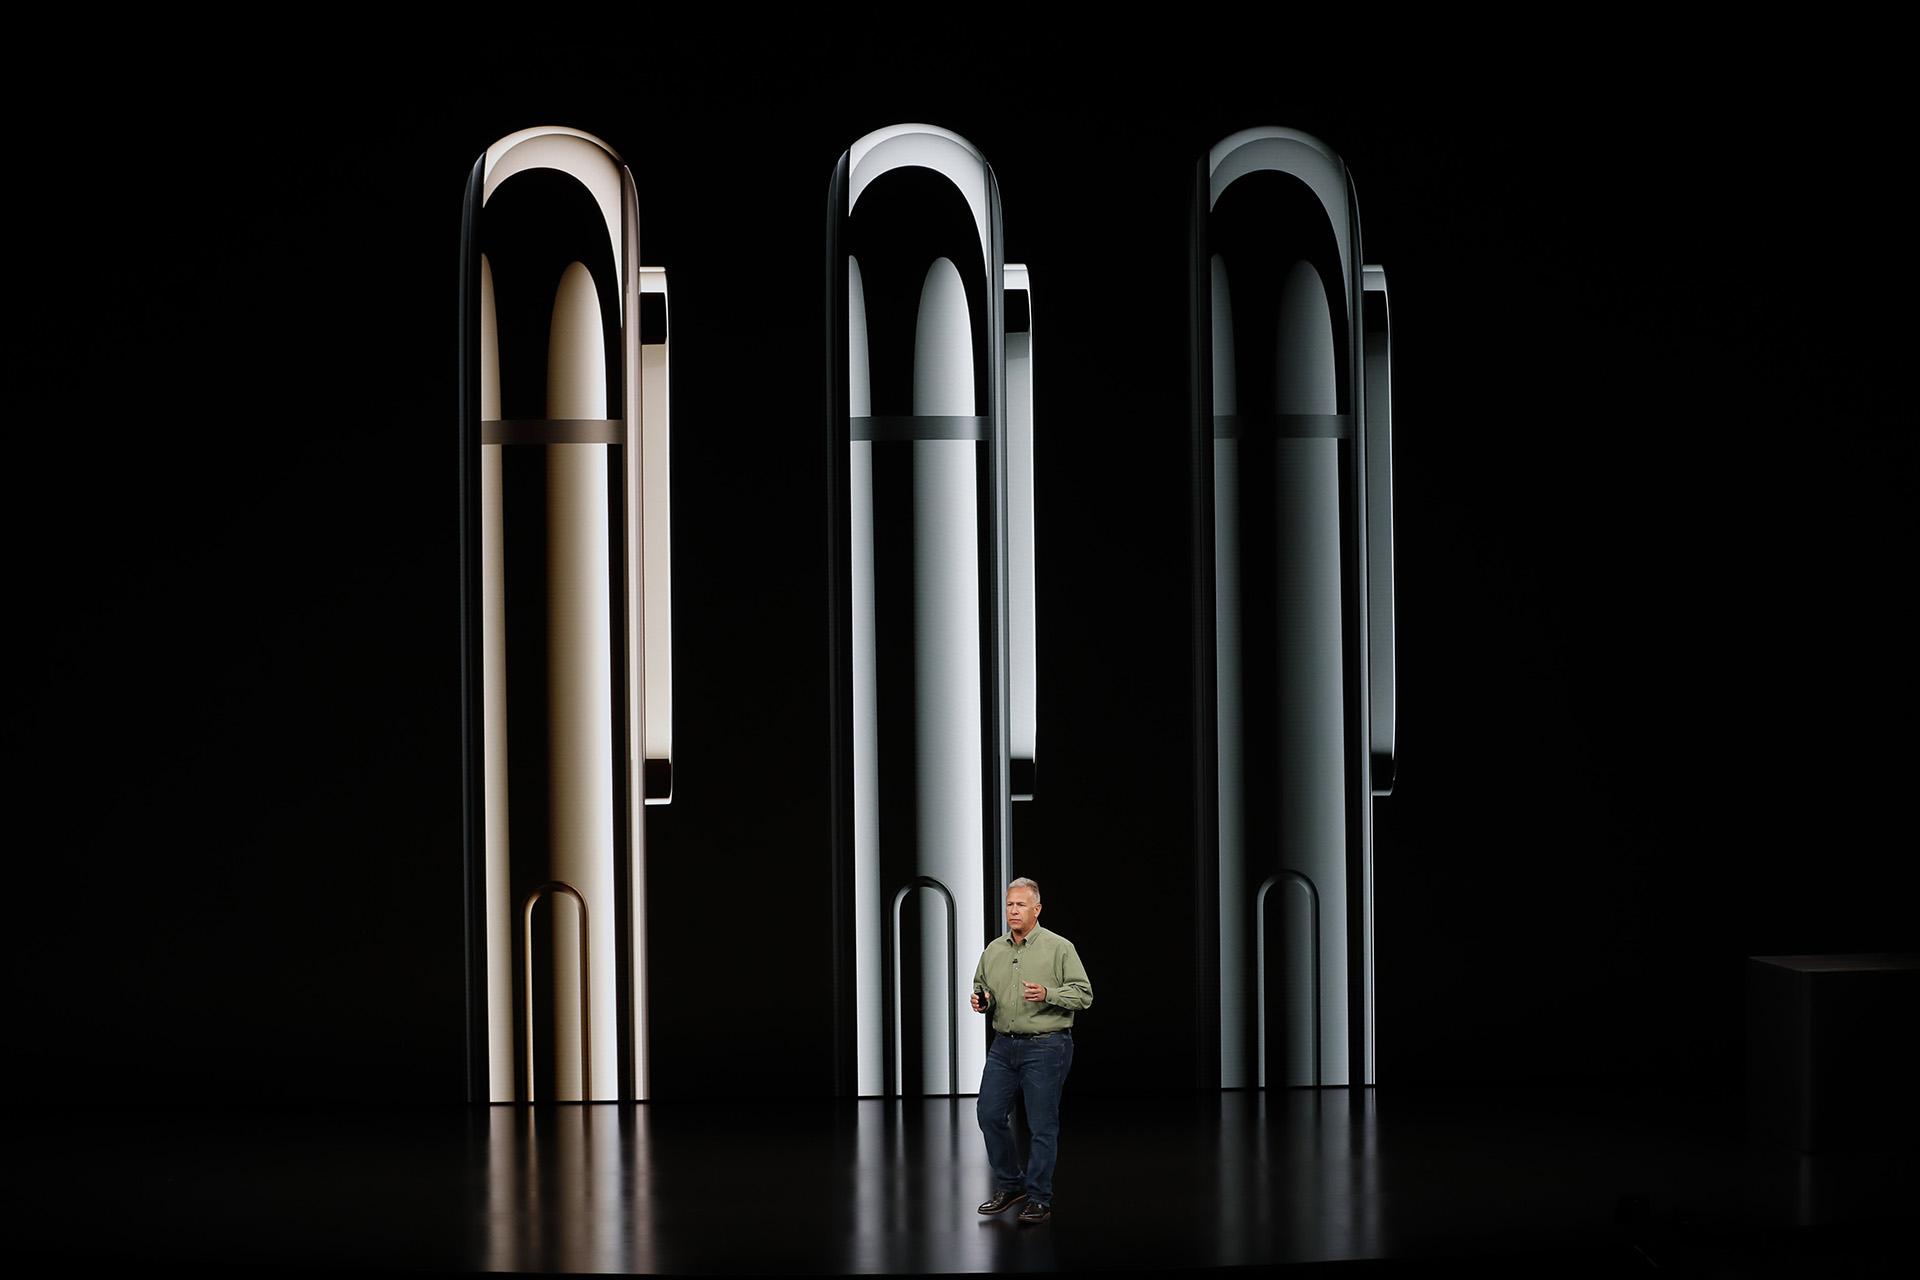 Philip W. Schiller, vice president senior de Apple, presentó los iPhone XS, XS Max y Xr (Reuters)